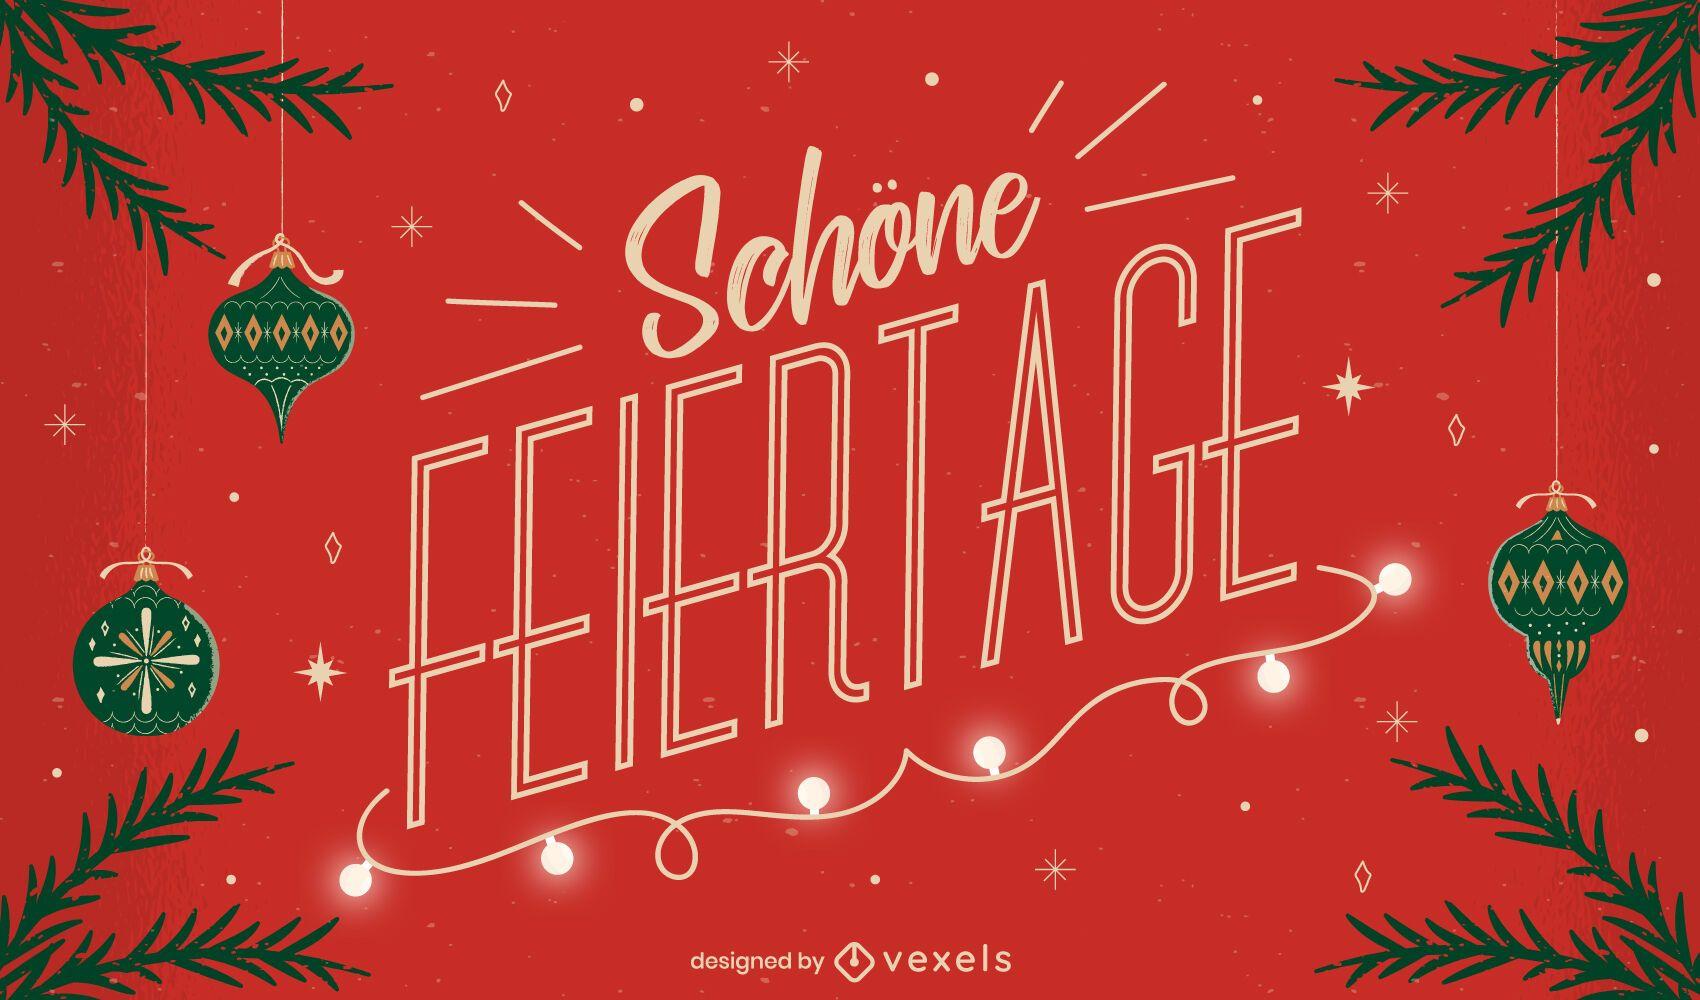 Festive Season German Quote Design